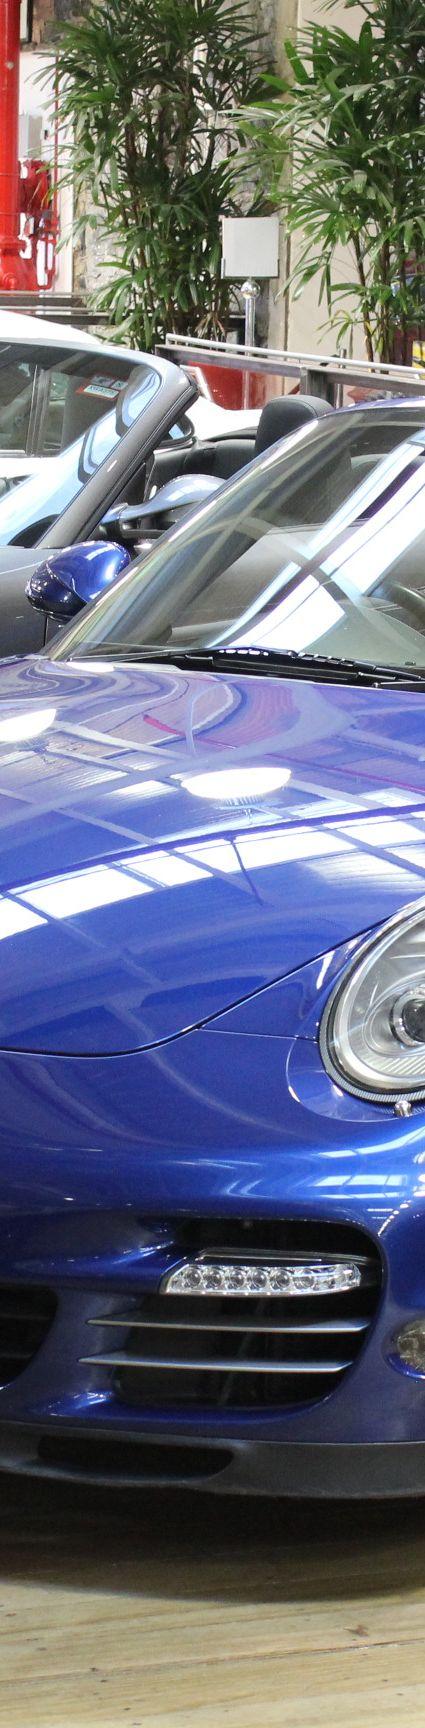 2011 Porsche 911 997 Series II Turbo S Convertible 2dr PDK 6sp AWD 3.8TT -  for sale in Australia